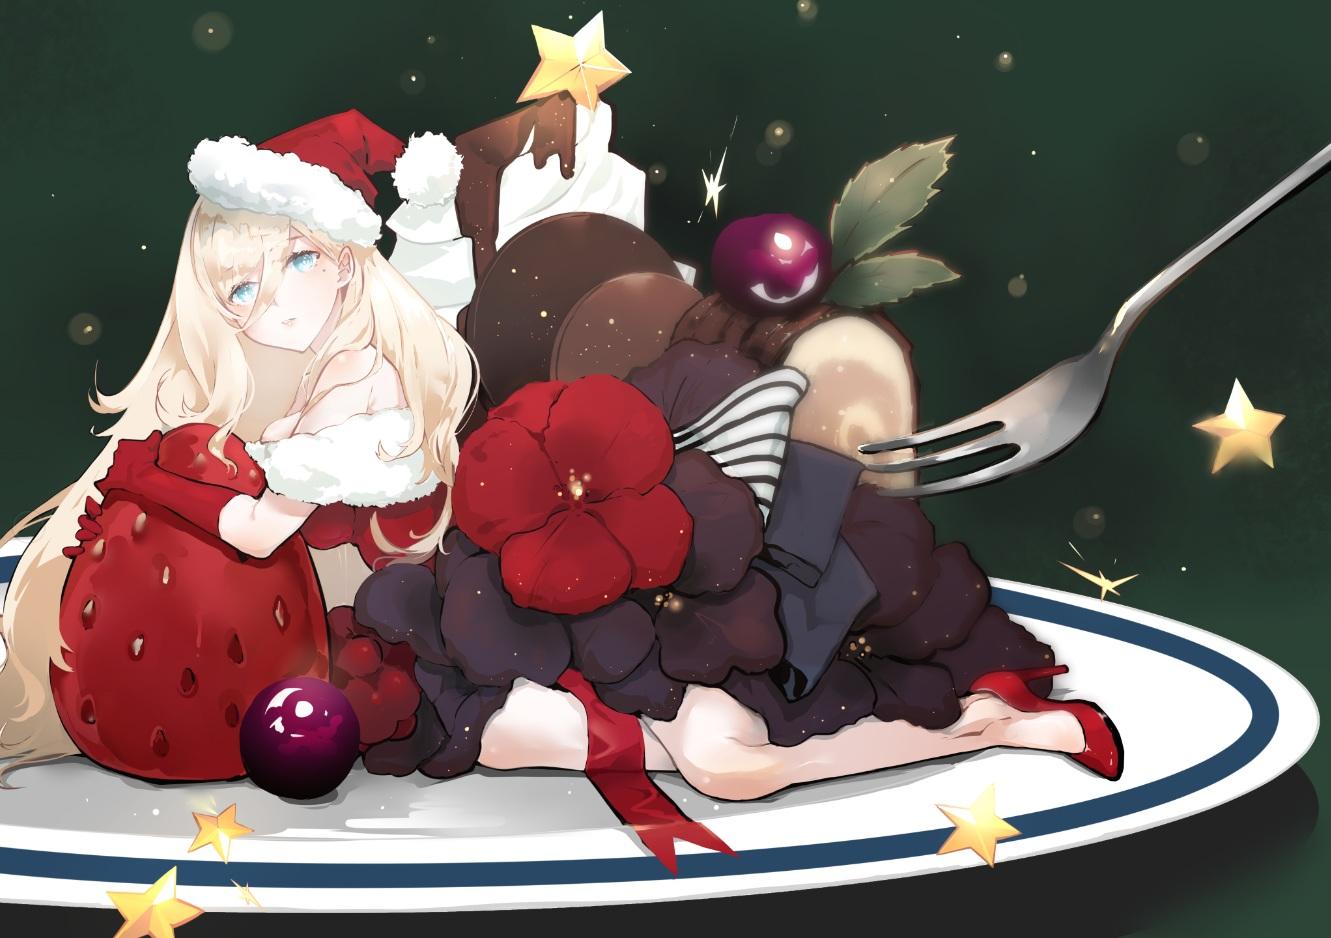 anthropomorphism blonde_hair breasts cake chocolate christmas dress flowers food fruit green_eyes hat kantai_collection long_hair nello_(luminous_darkness) richelieu_(kancolle) santa_hat strawberry